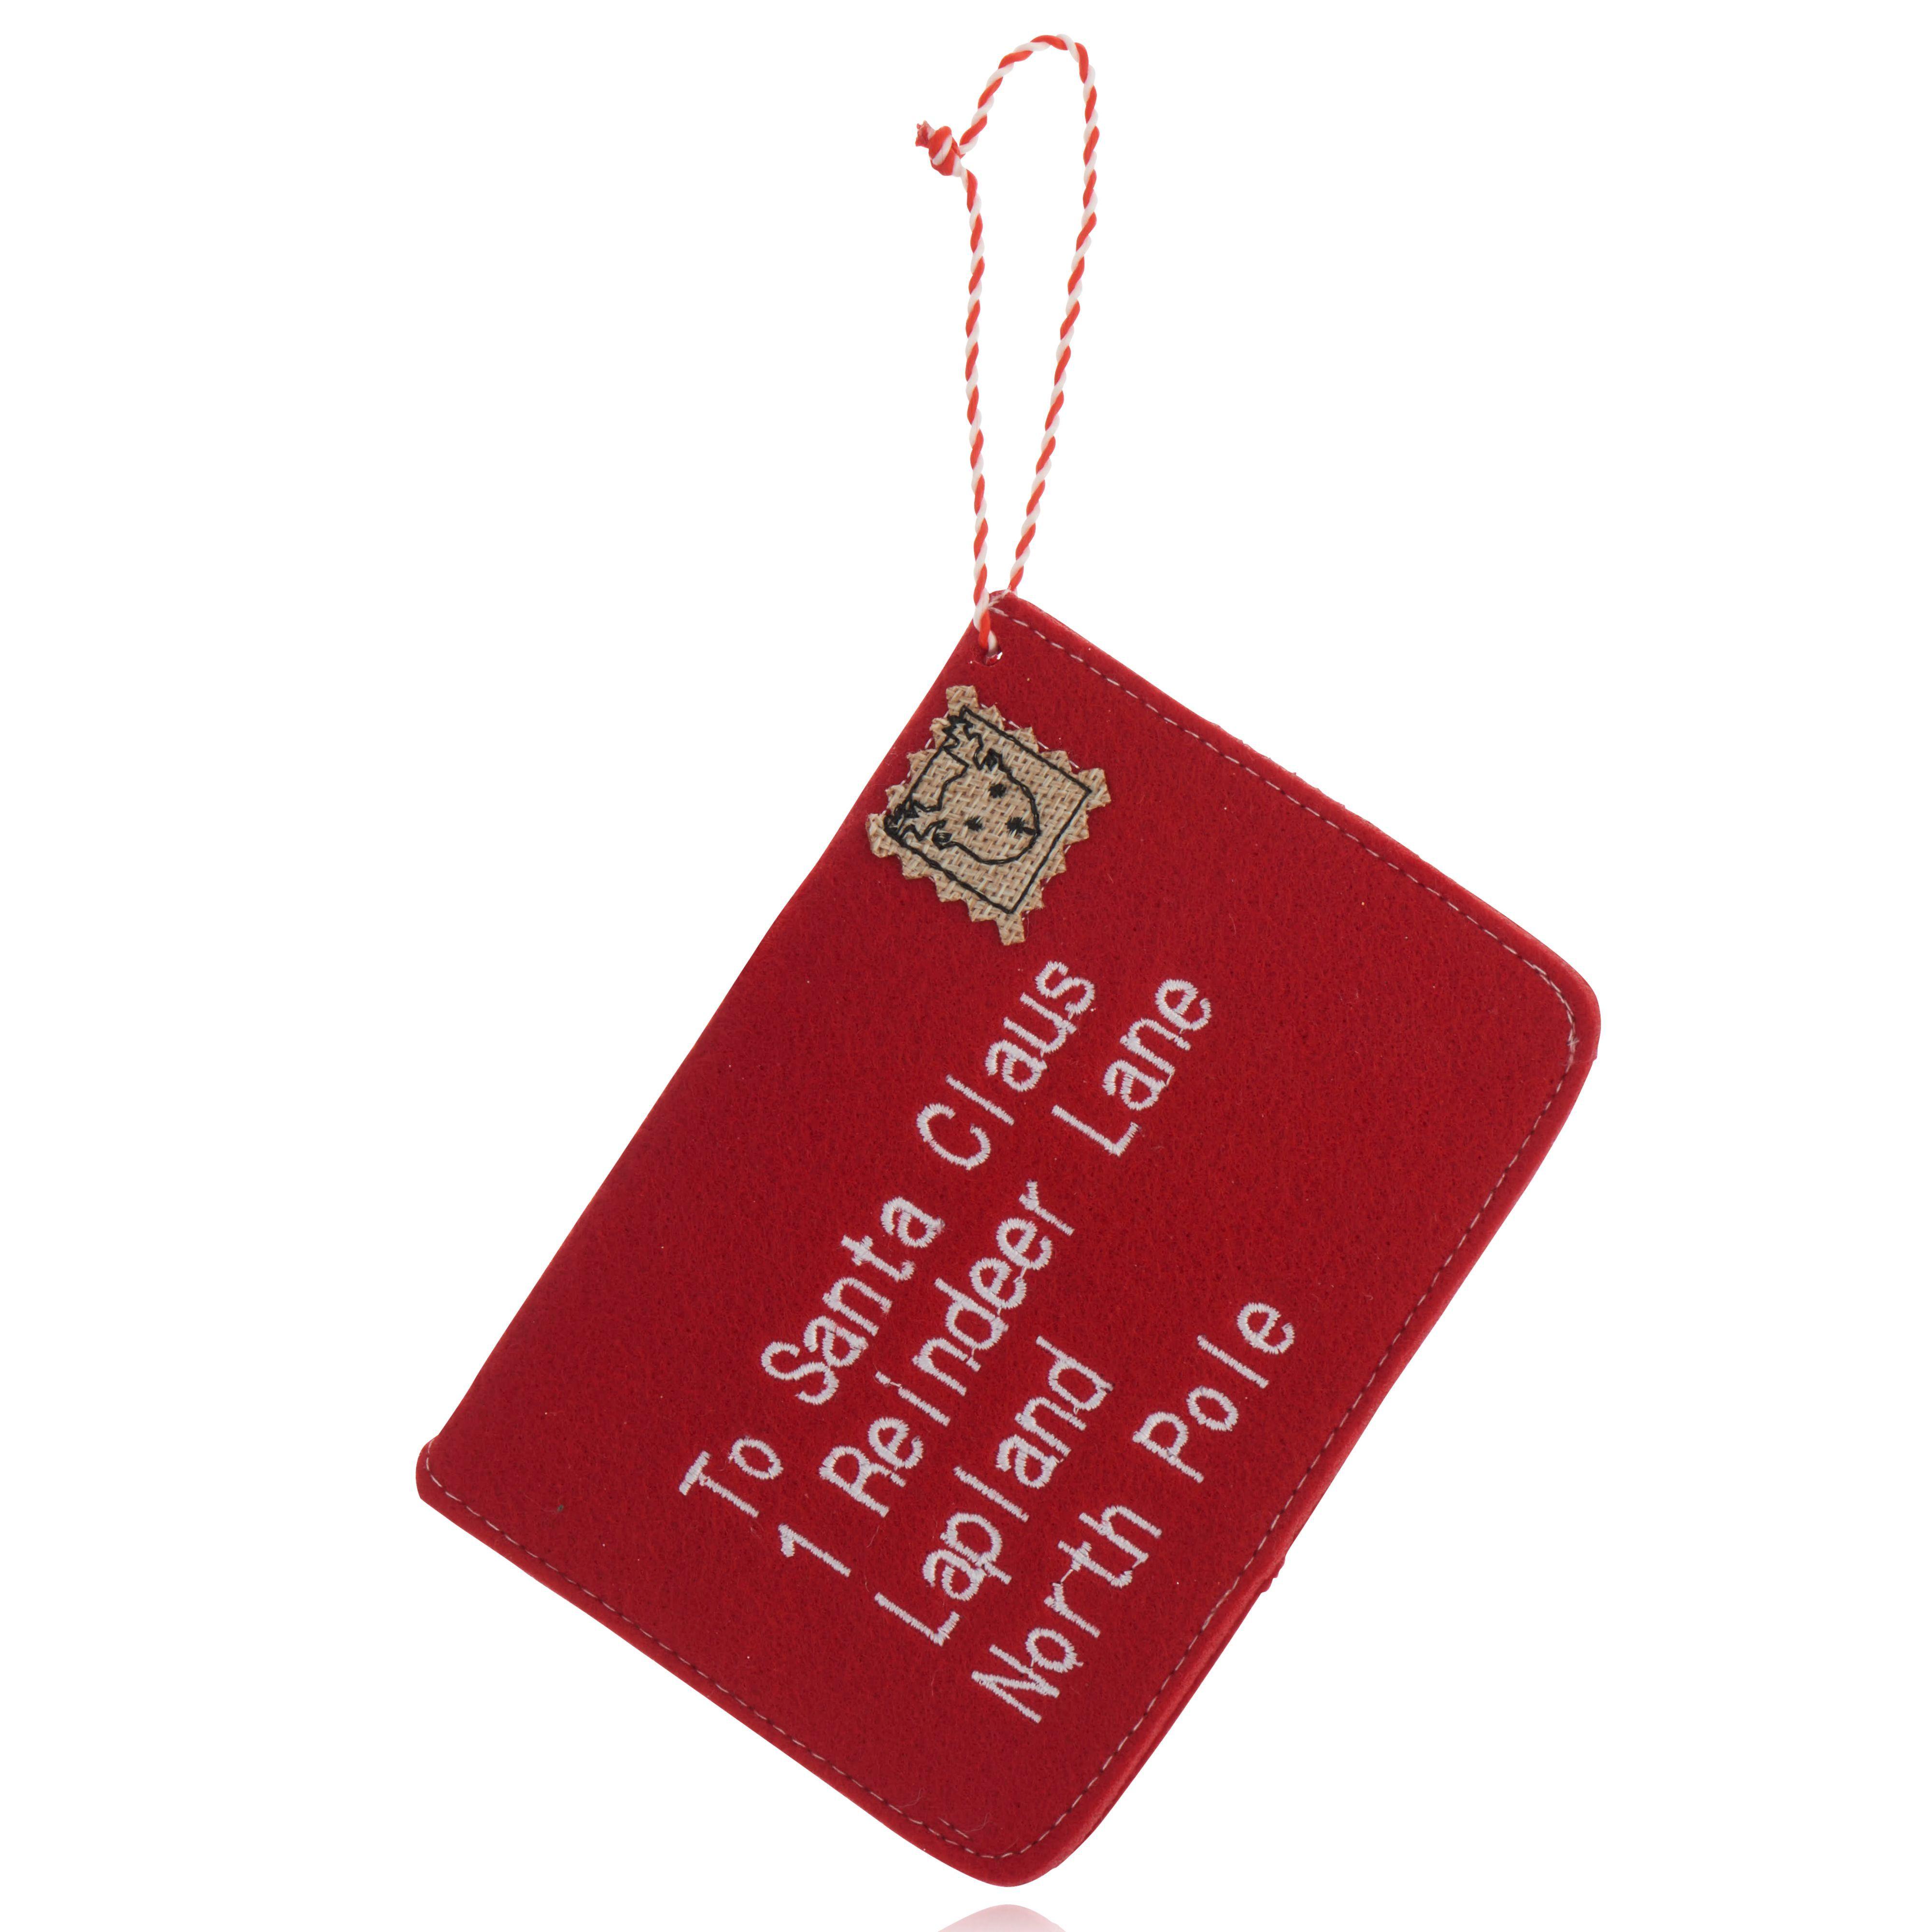 Red Santa Claus Envelope Decoration